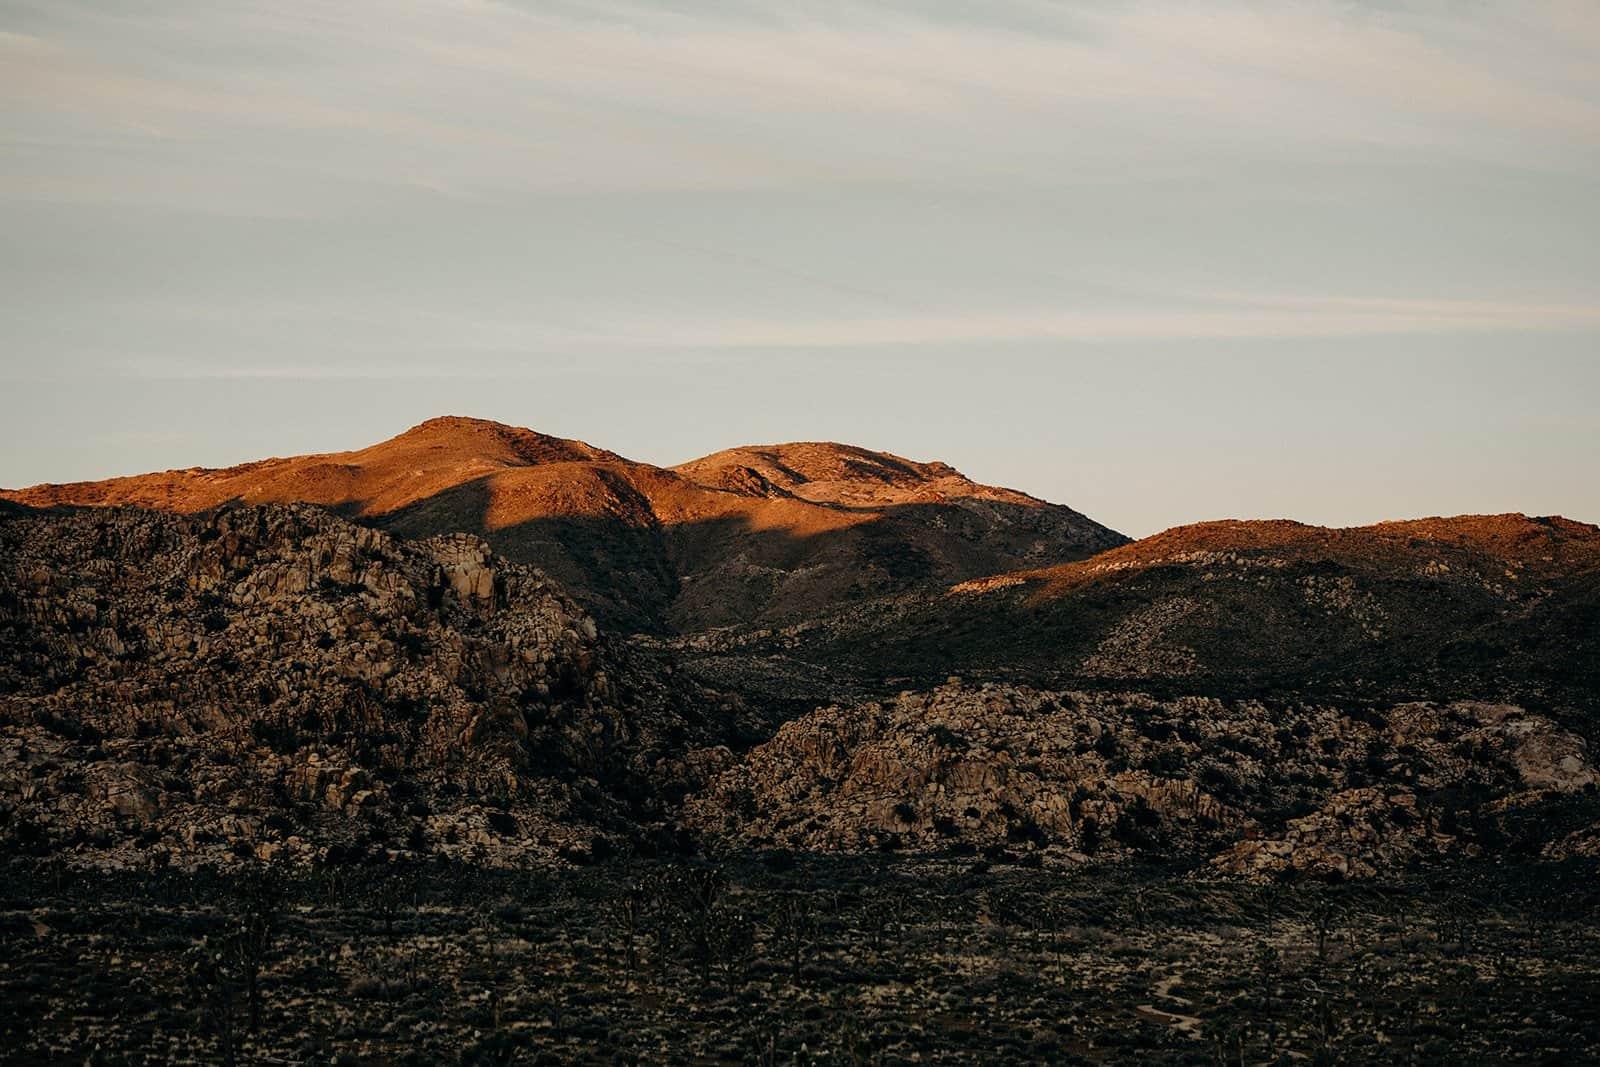 sunrise in Joshua Tree